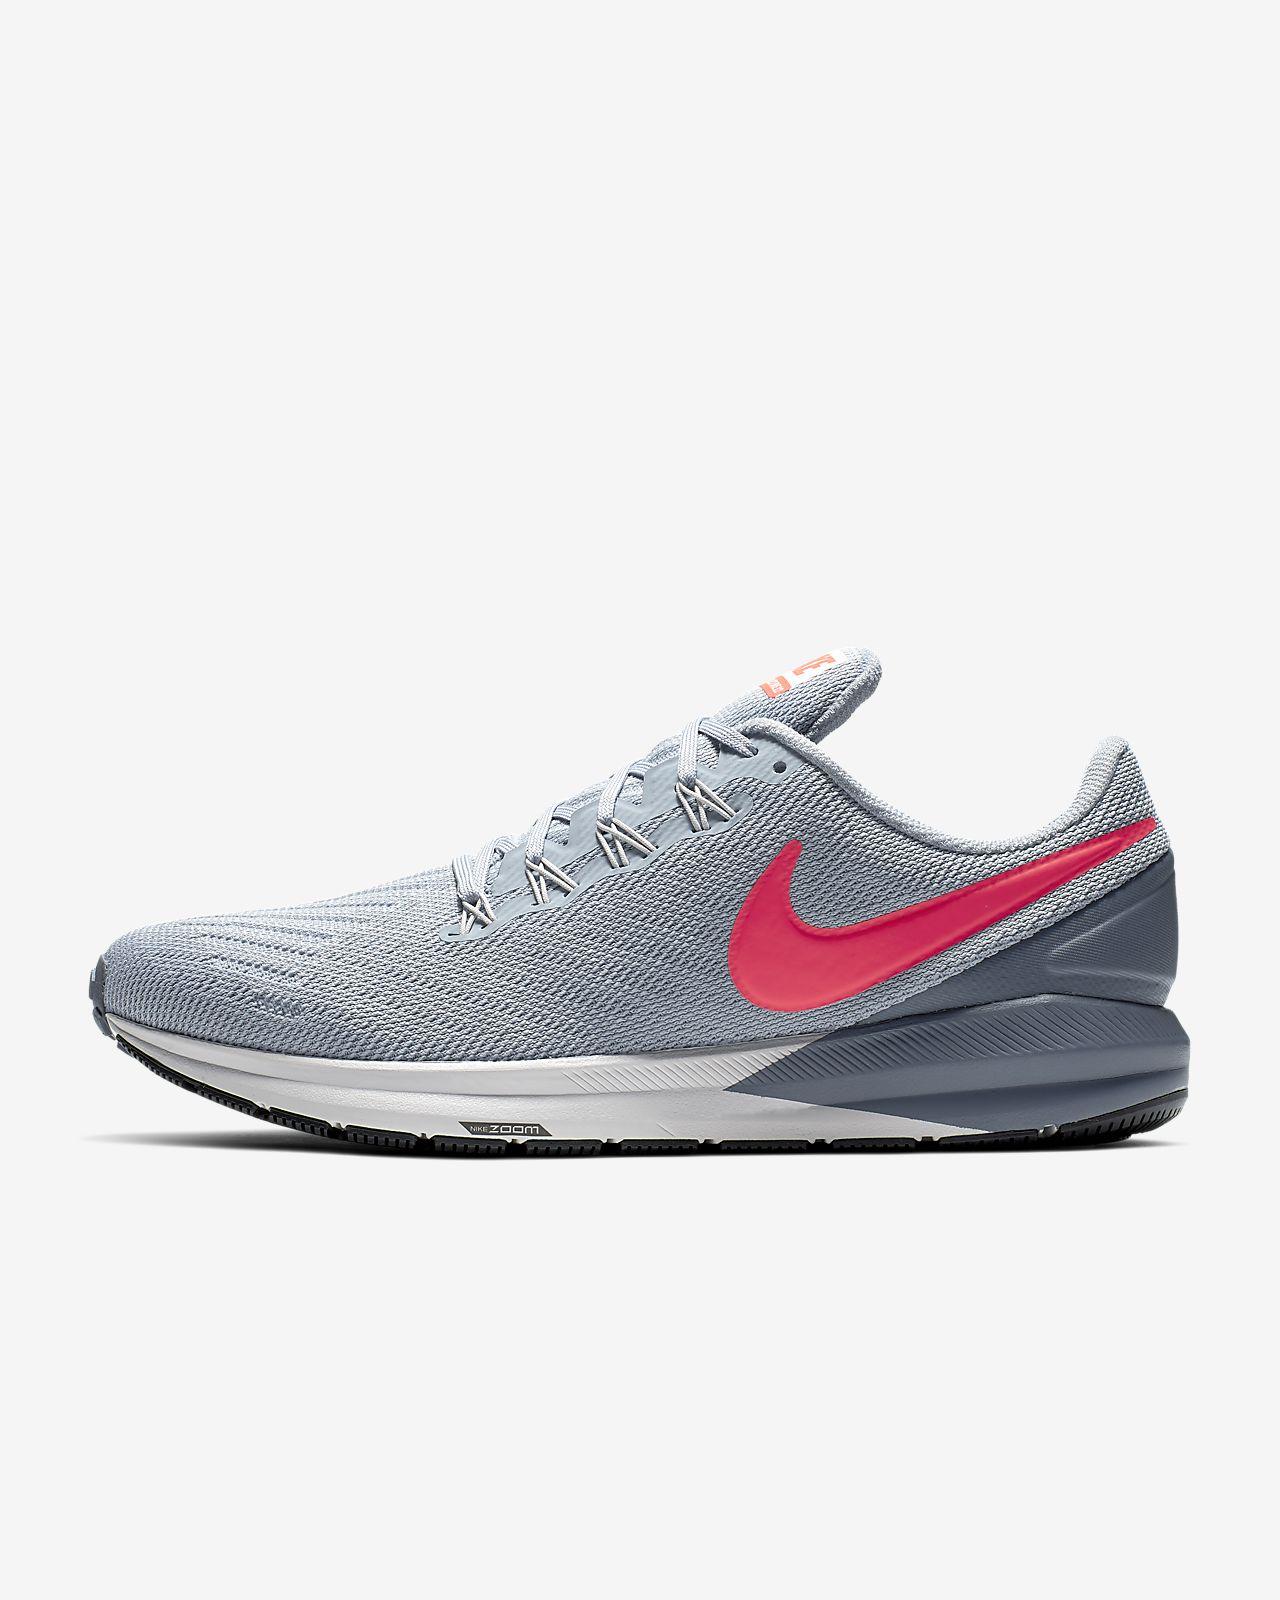 Мужские беговые кроссовки Nike Air Zoom Structure 22